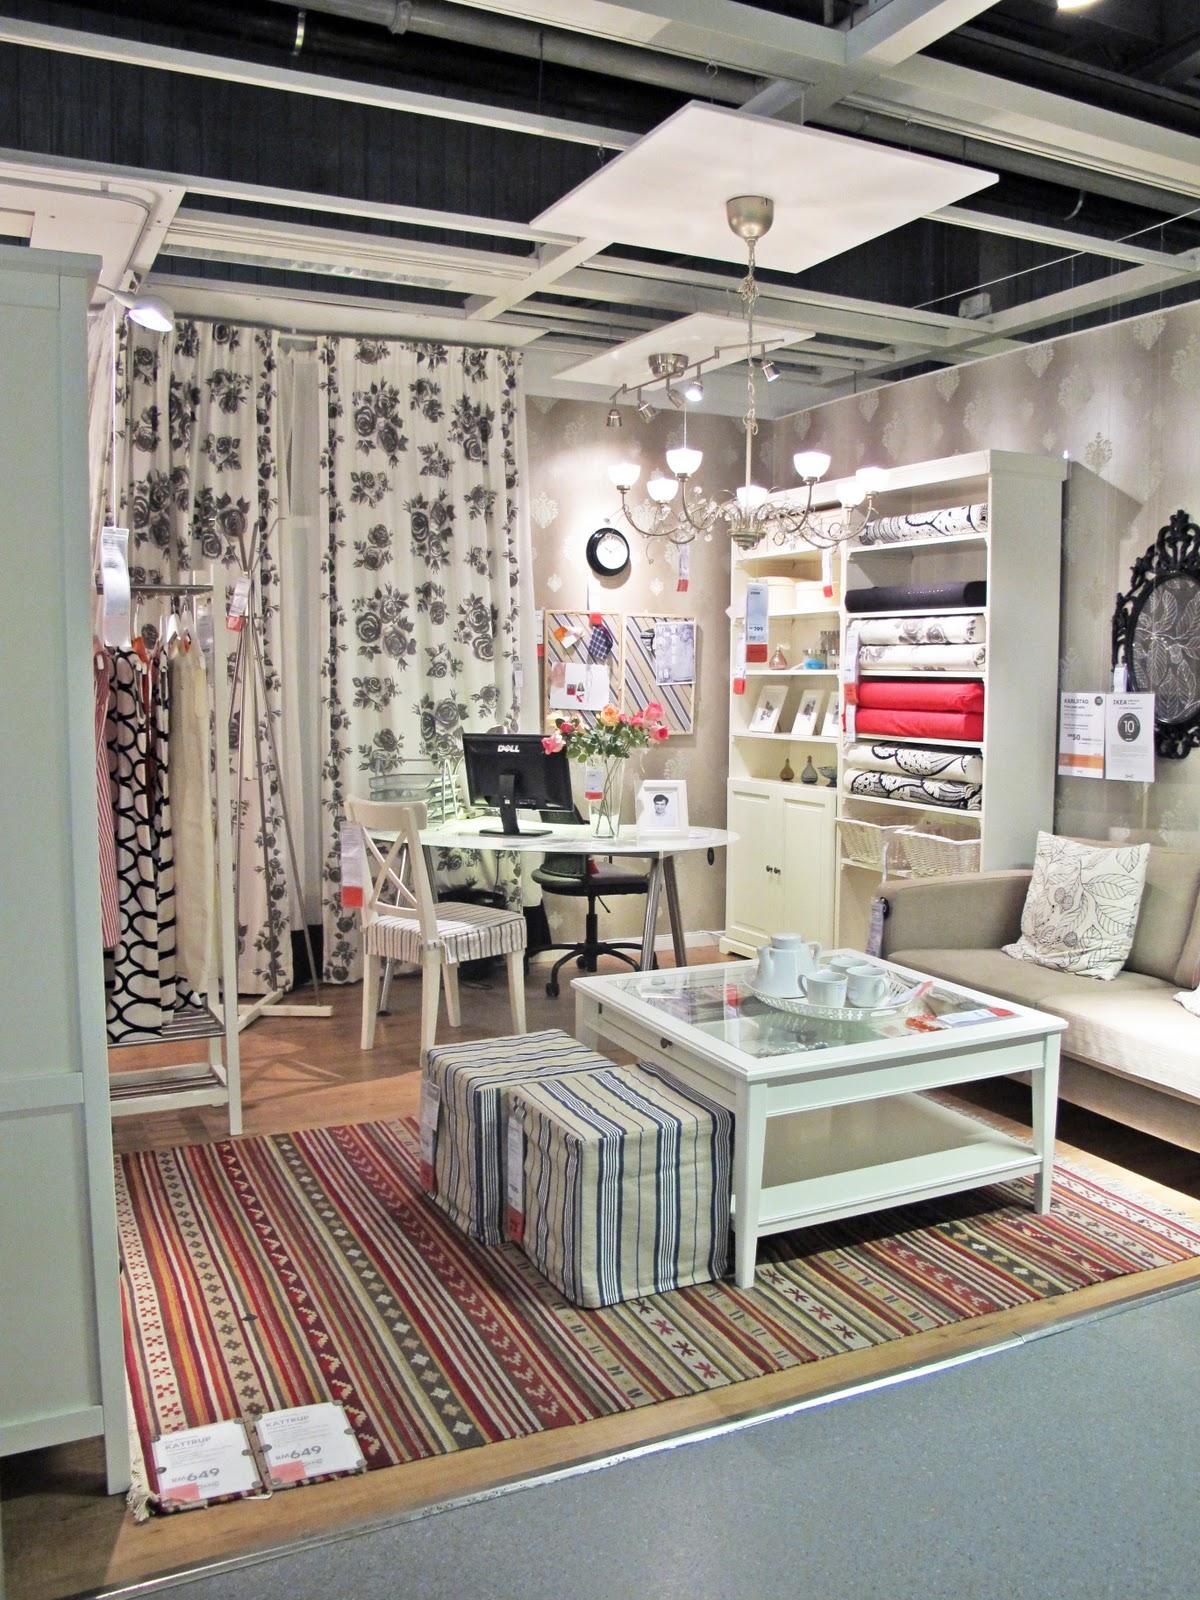 Sweetheart Studio Ikea Sewing Shop Showroom